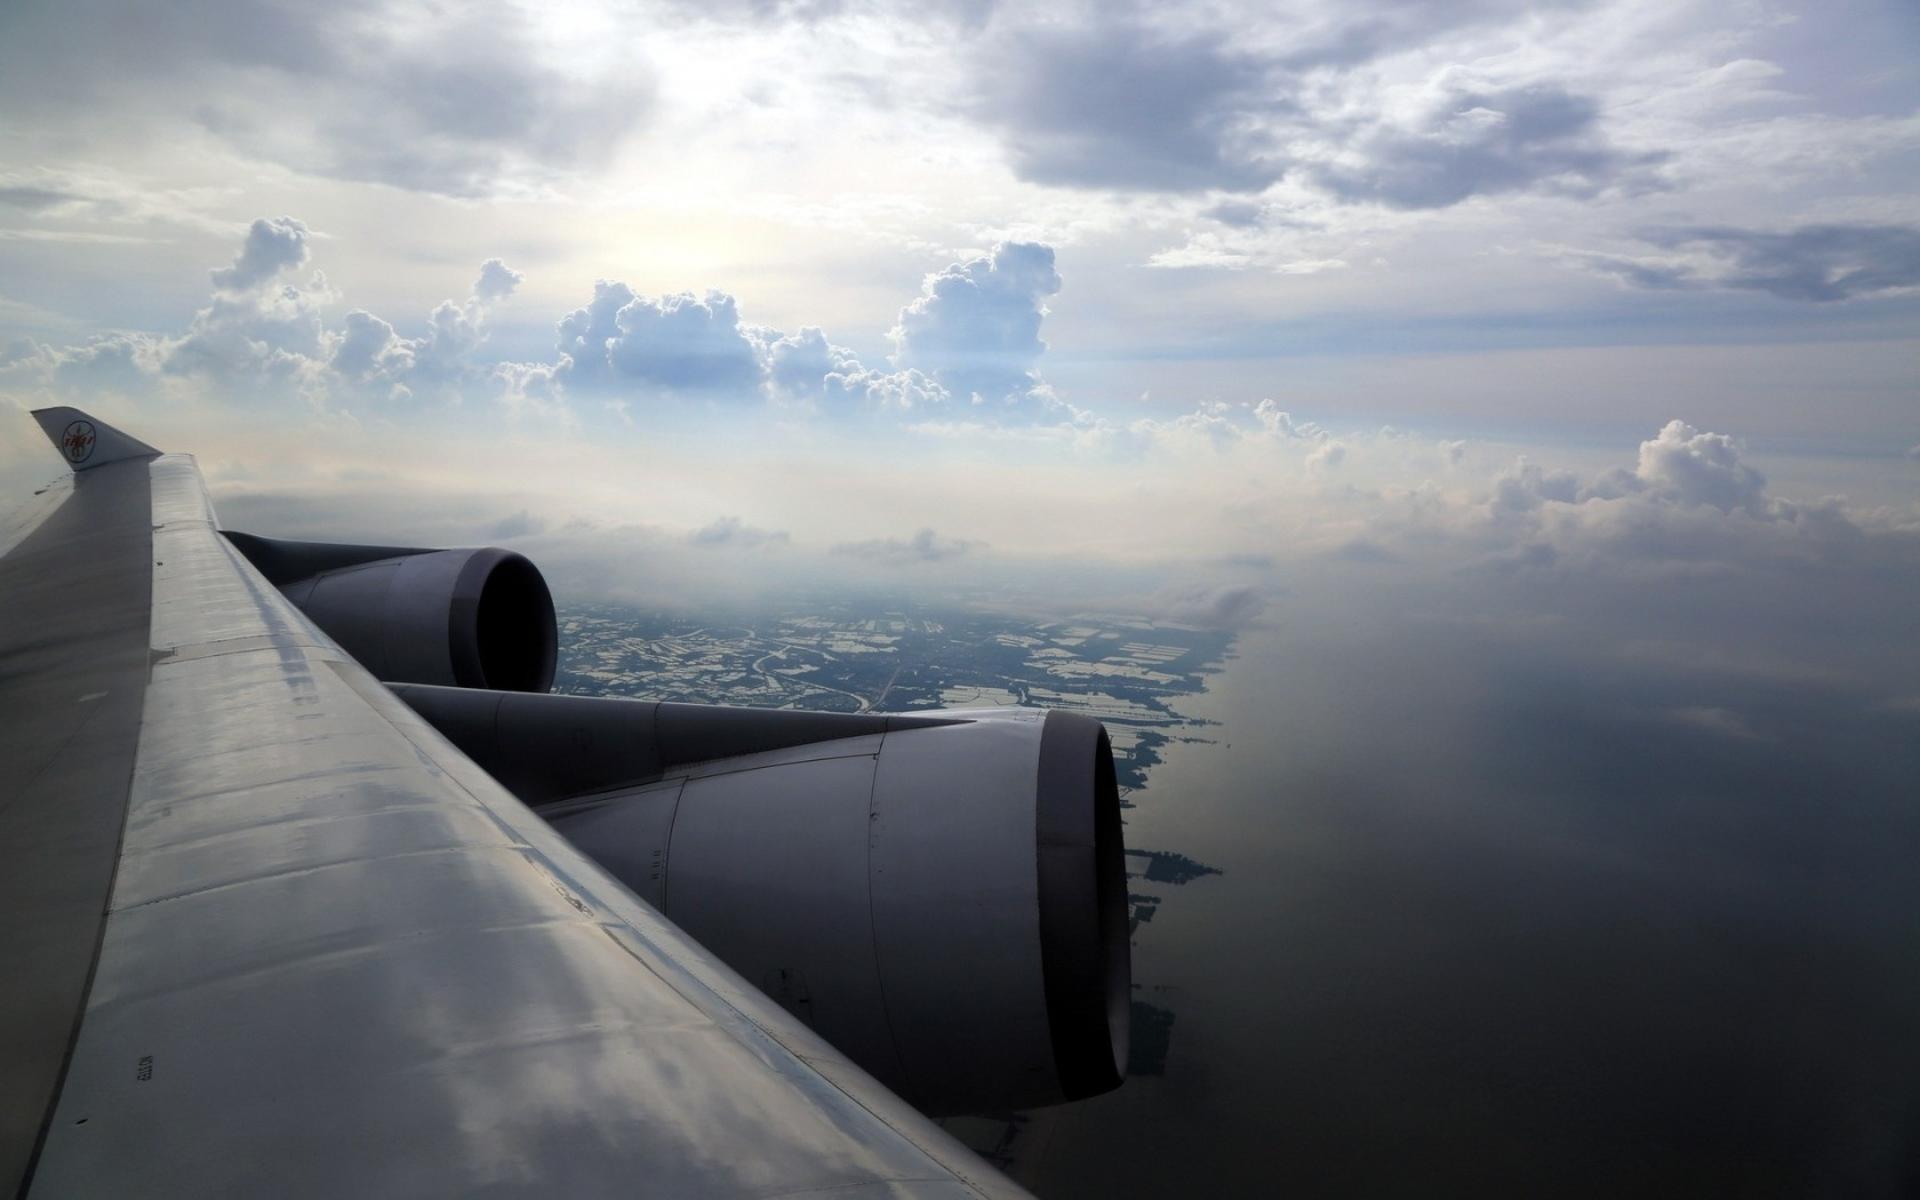 Aircraft Hd Wallpaper - Iphone 7 Plus Hd Wallpaper Plane , HD Wallpaper & Backgrounds